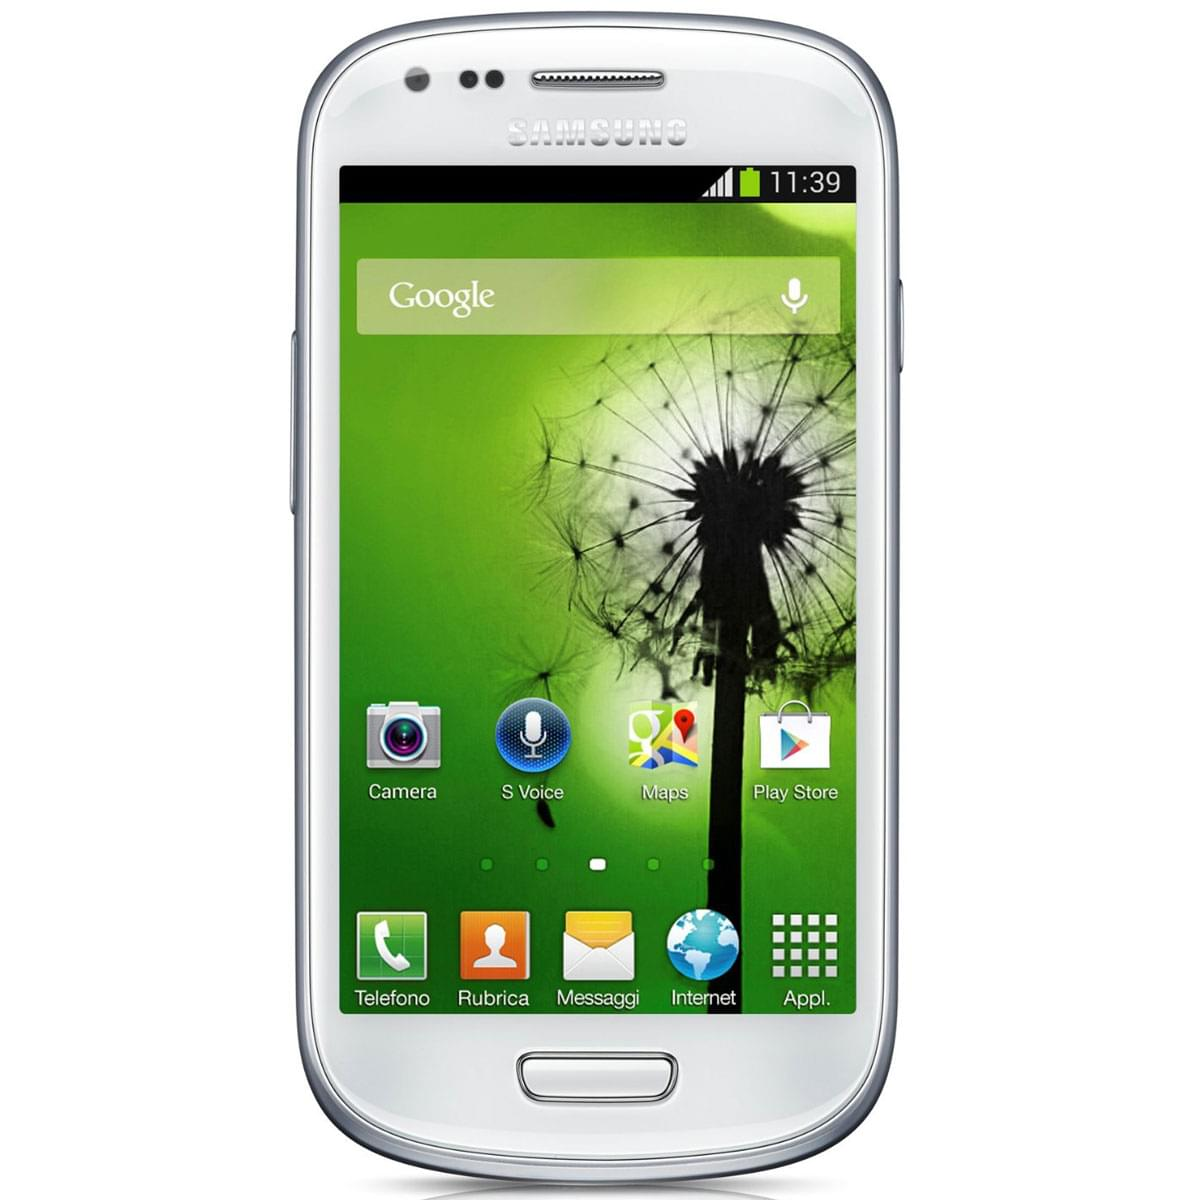 Samsung Galaxy S3 Mini 8Go GT-i8200 White (GT-I8200W) - Achat / Vente Téléphonie sur Cybertek.fr - 0